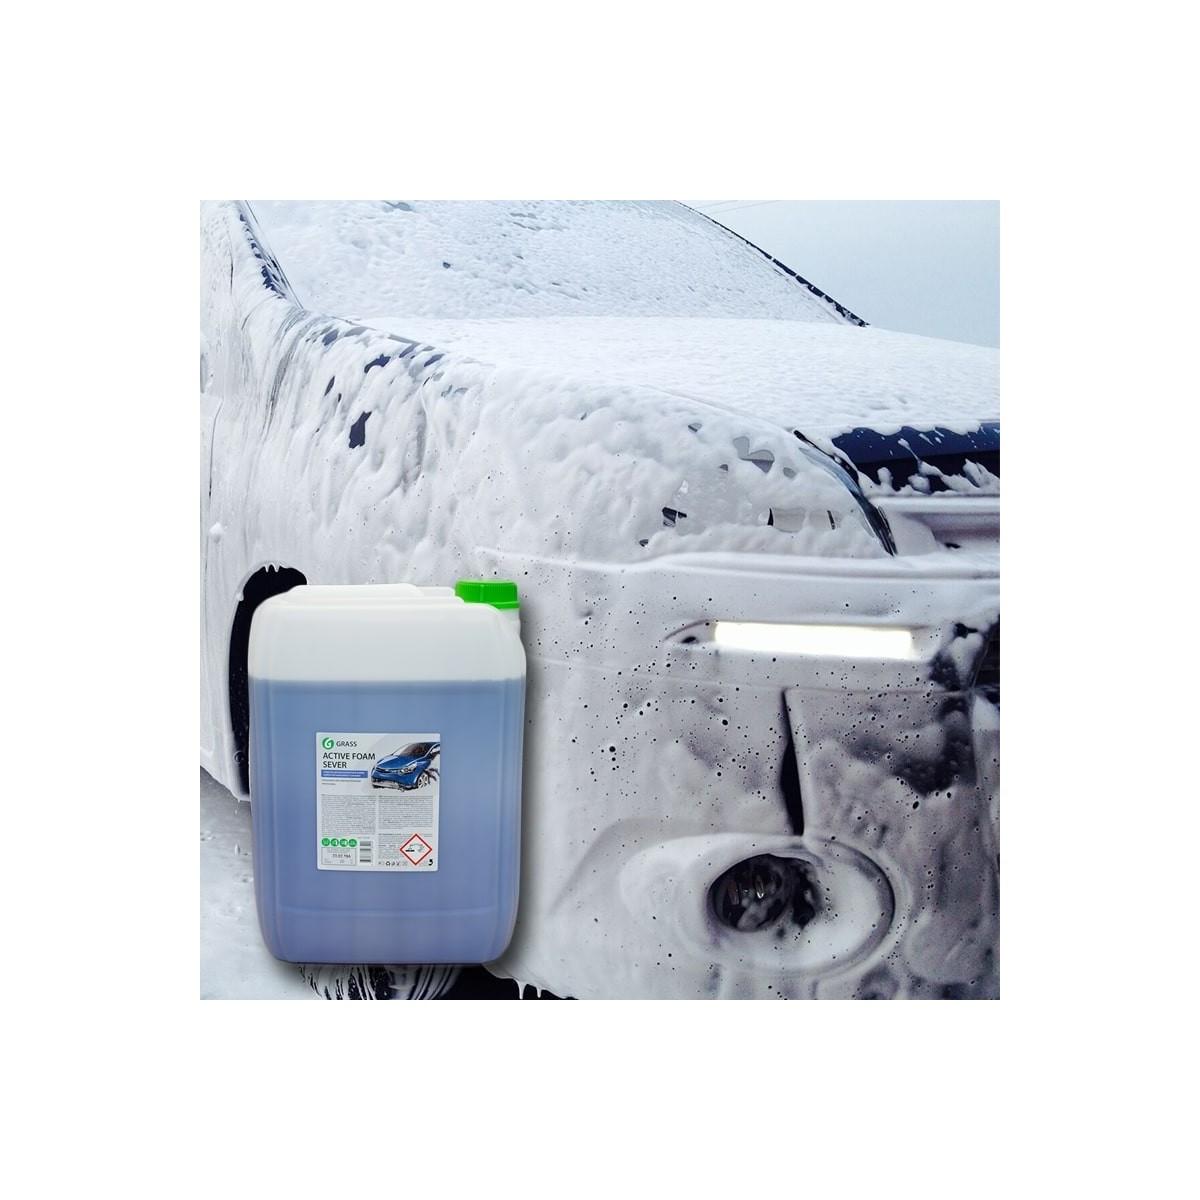 Solutie spalare fara apa polish auto lichid REFLEX DRY Kimicar 12Kg